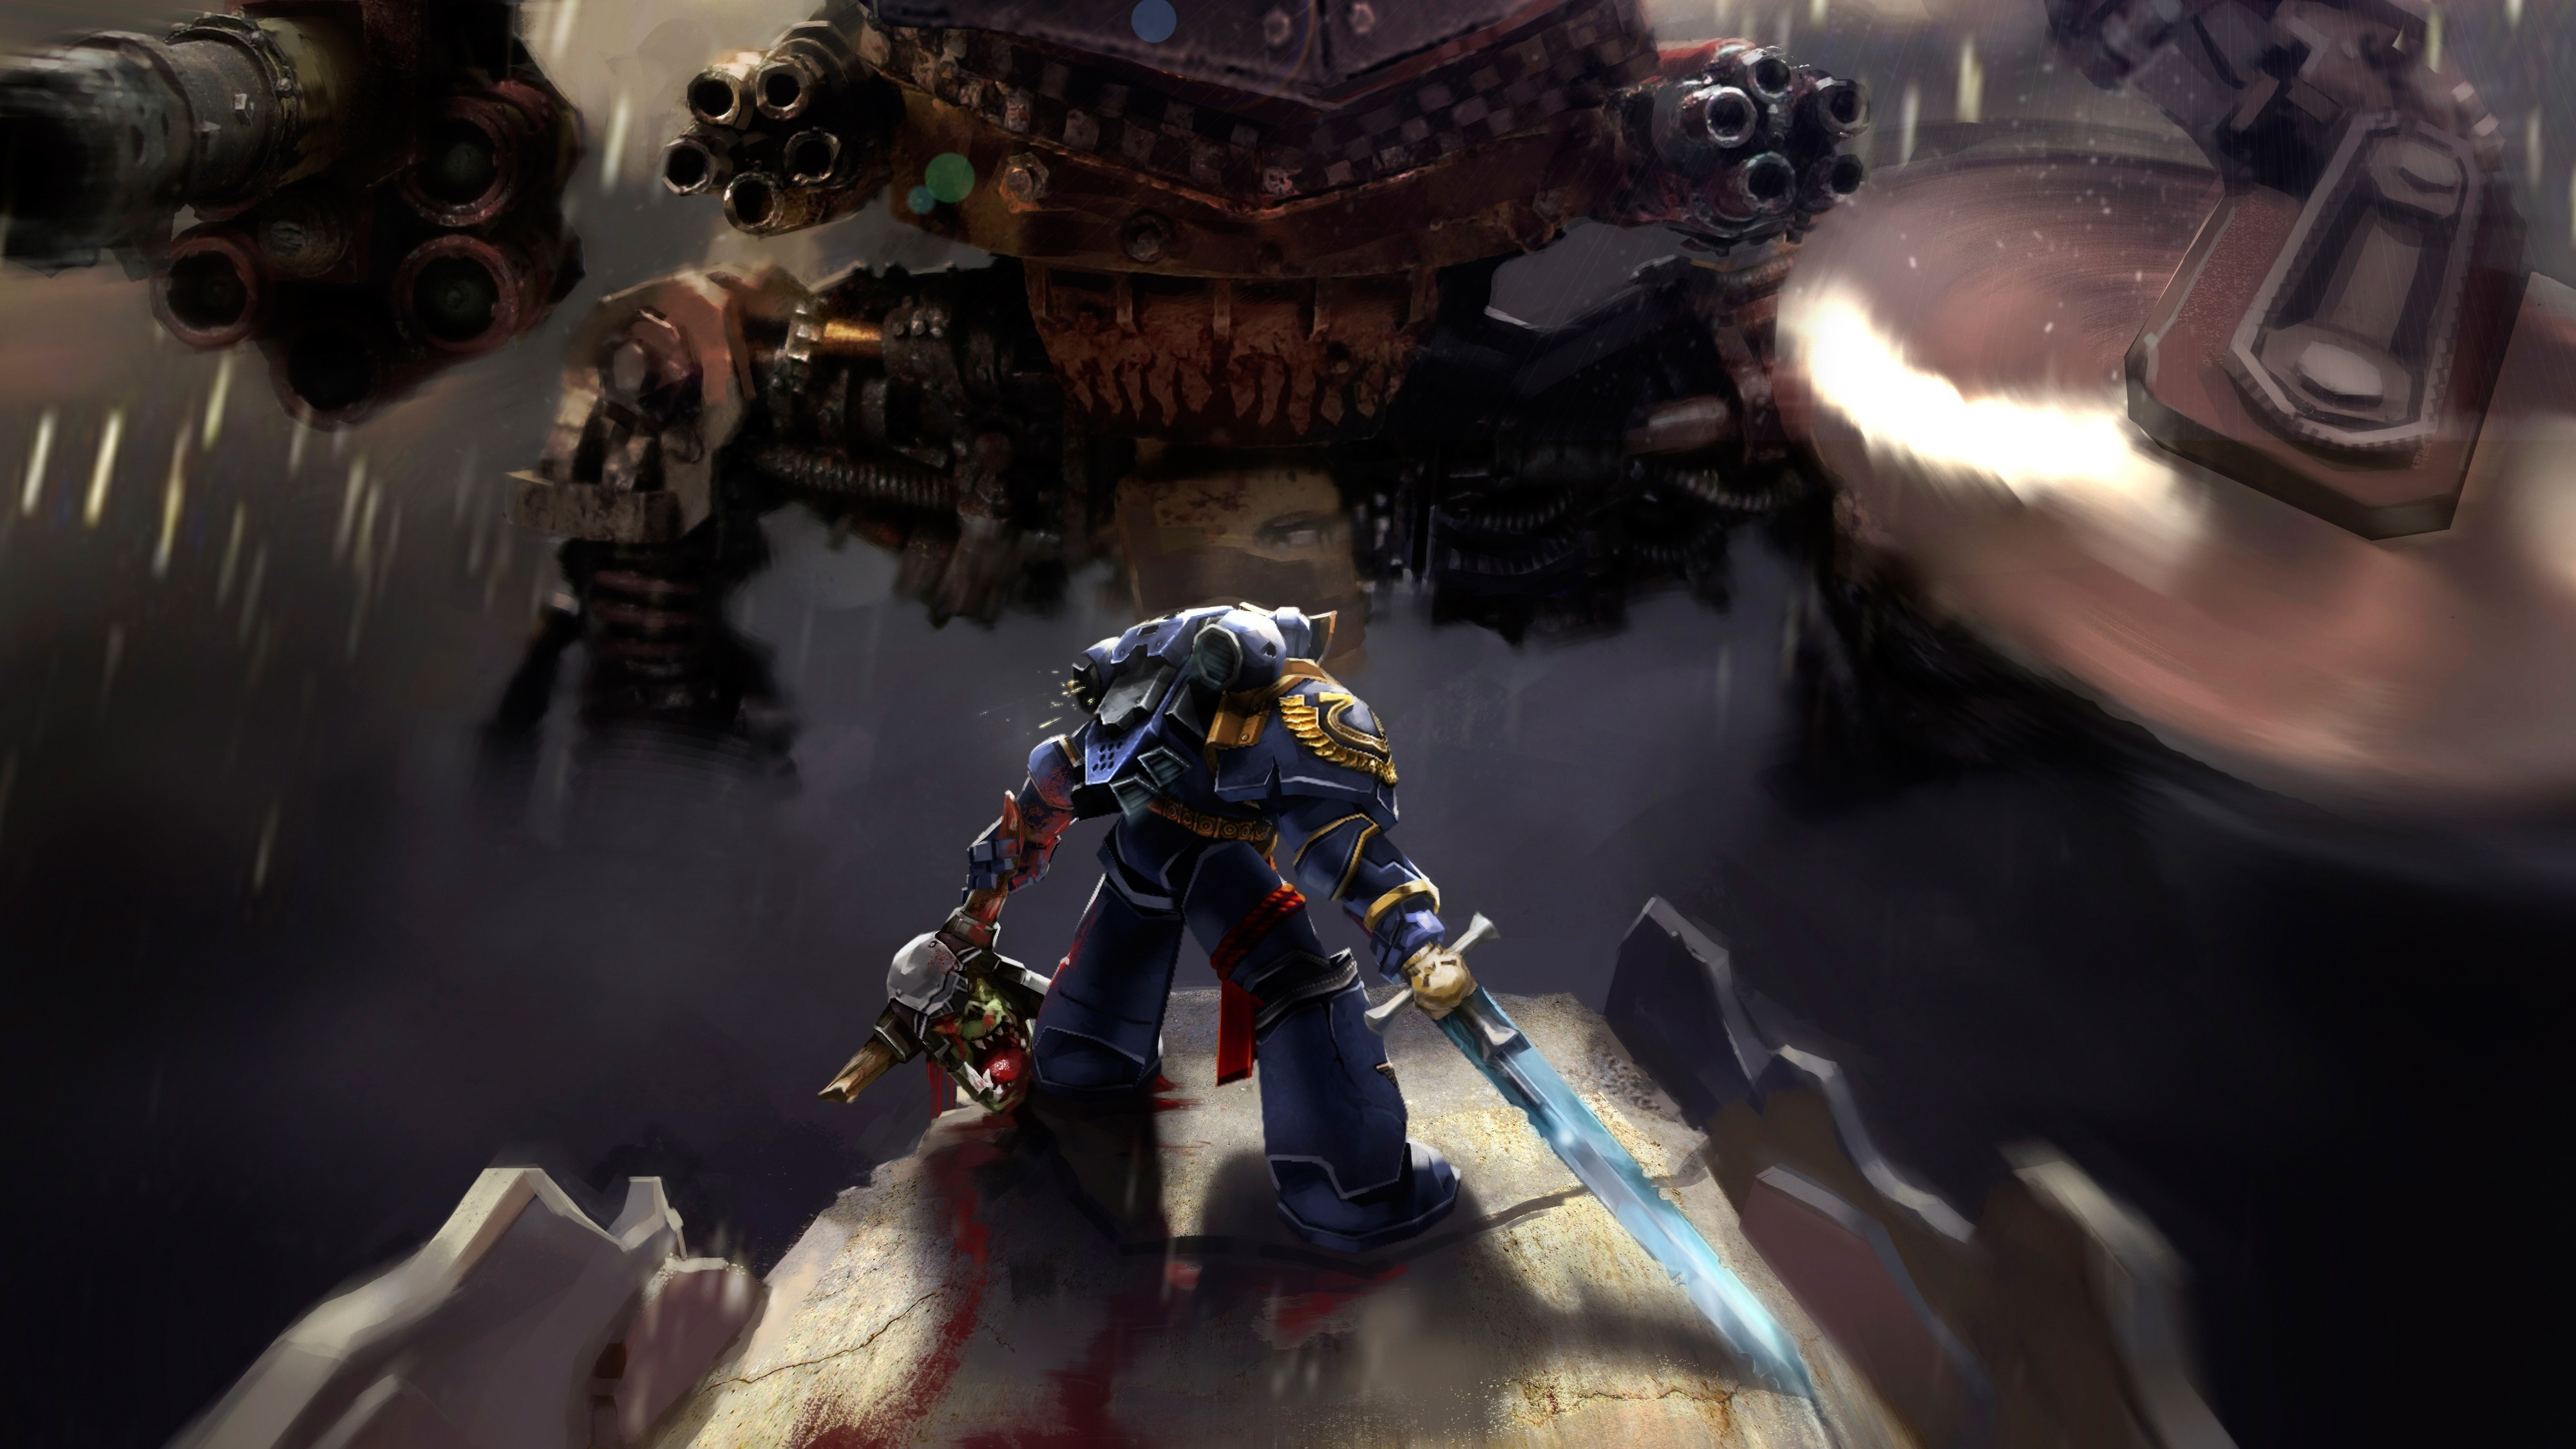 wallpaper warhammer 40k space marine, ultramarines, 4k, games, #5249